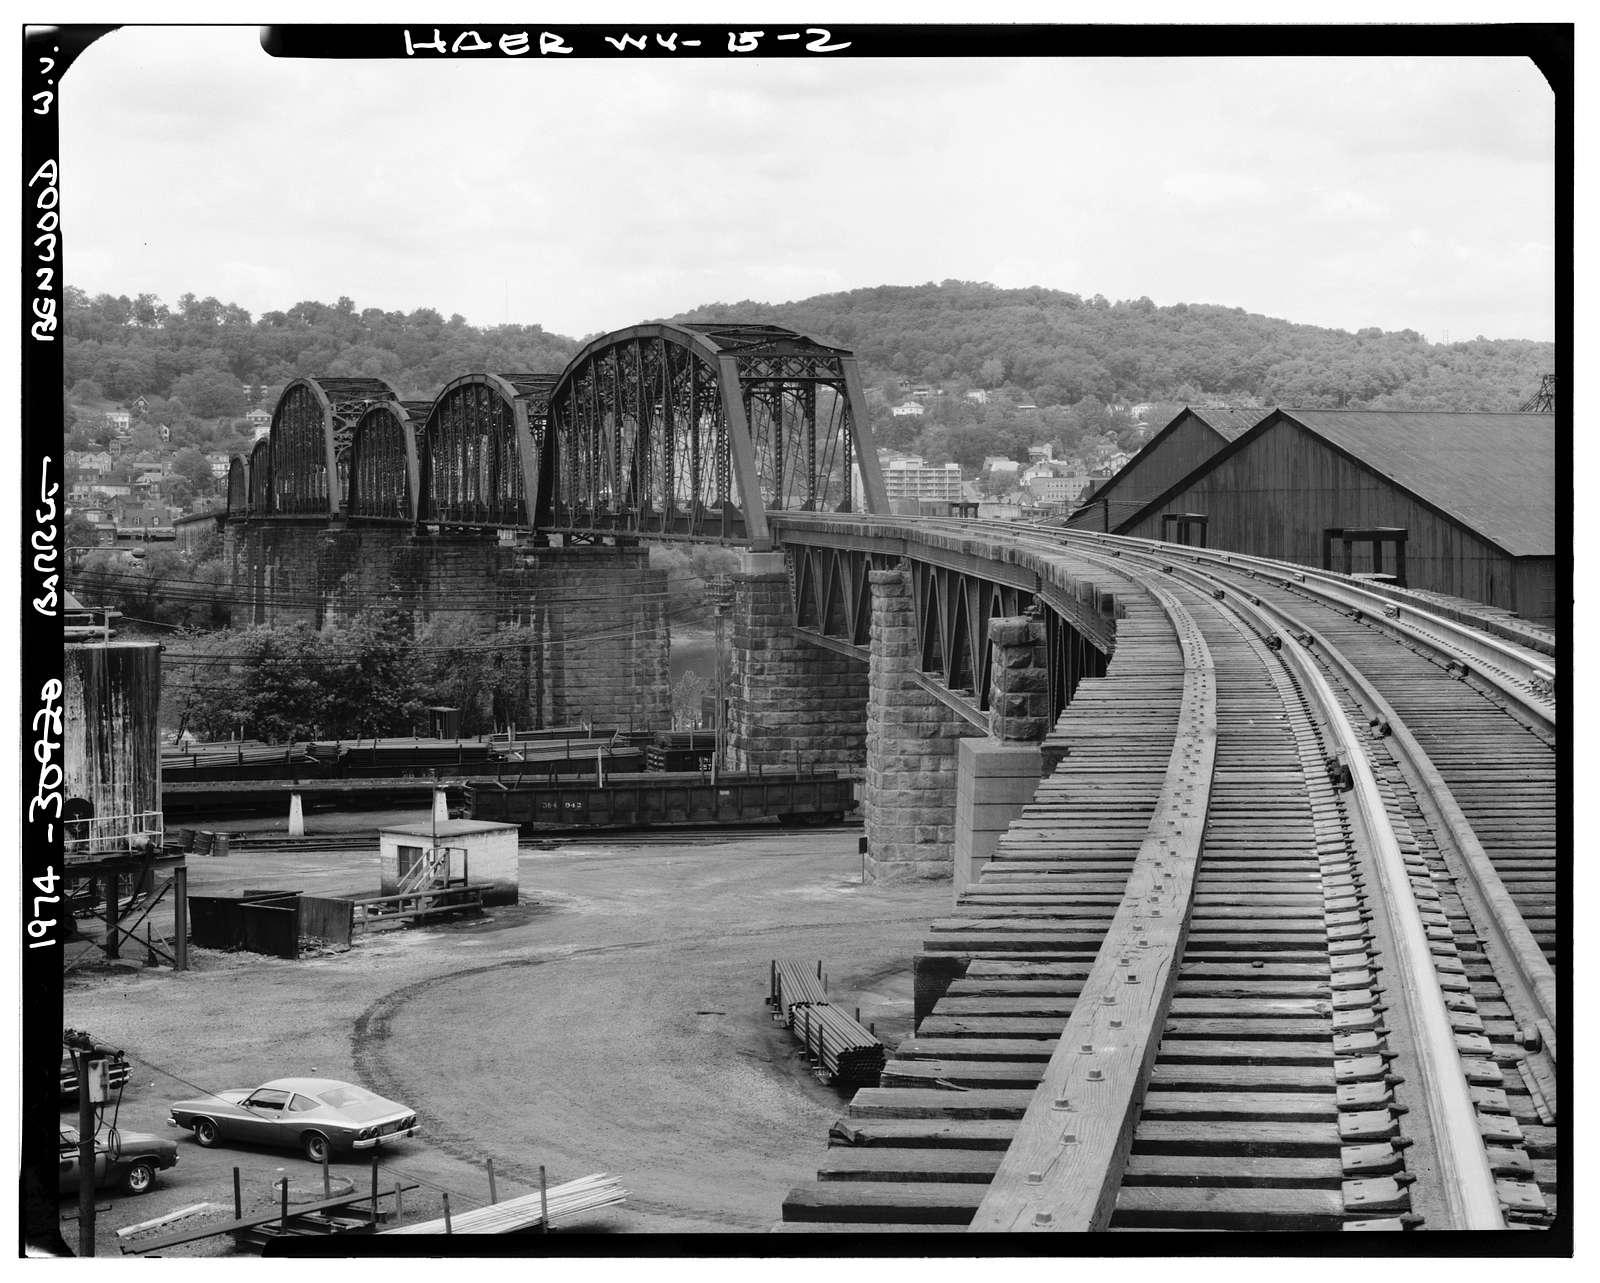 Baltimore & Ohio Railroad, Benwood Bridge, Benwood, Marshall County, WV